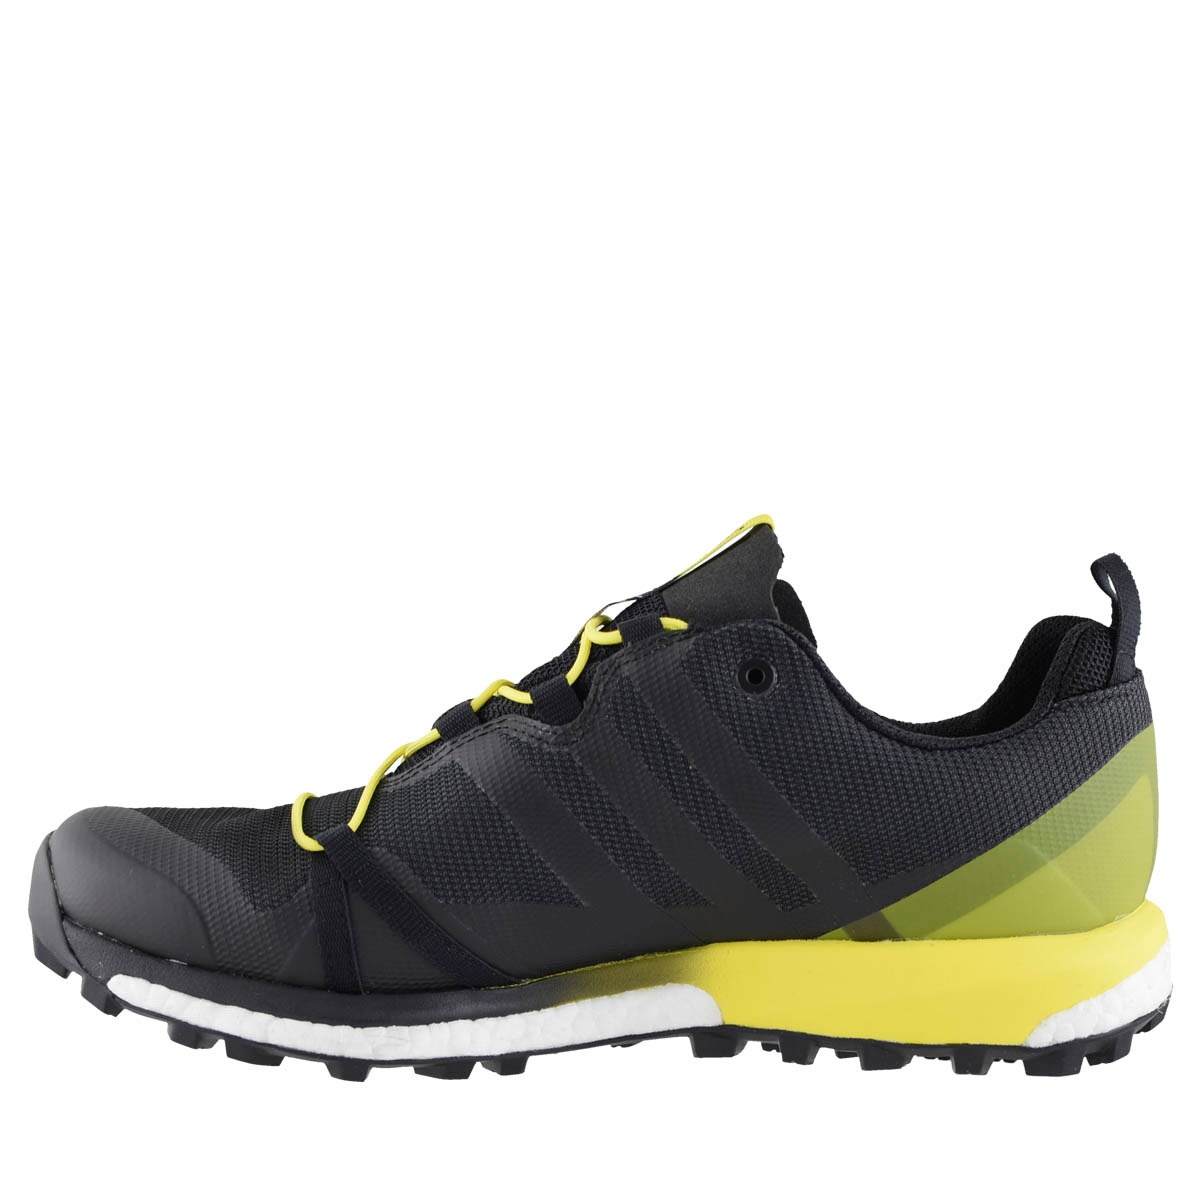 on sale 0c142 6e39d zapatillas adidas hombre. Cargando zoom.